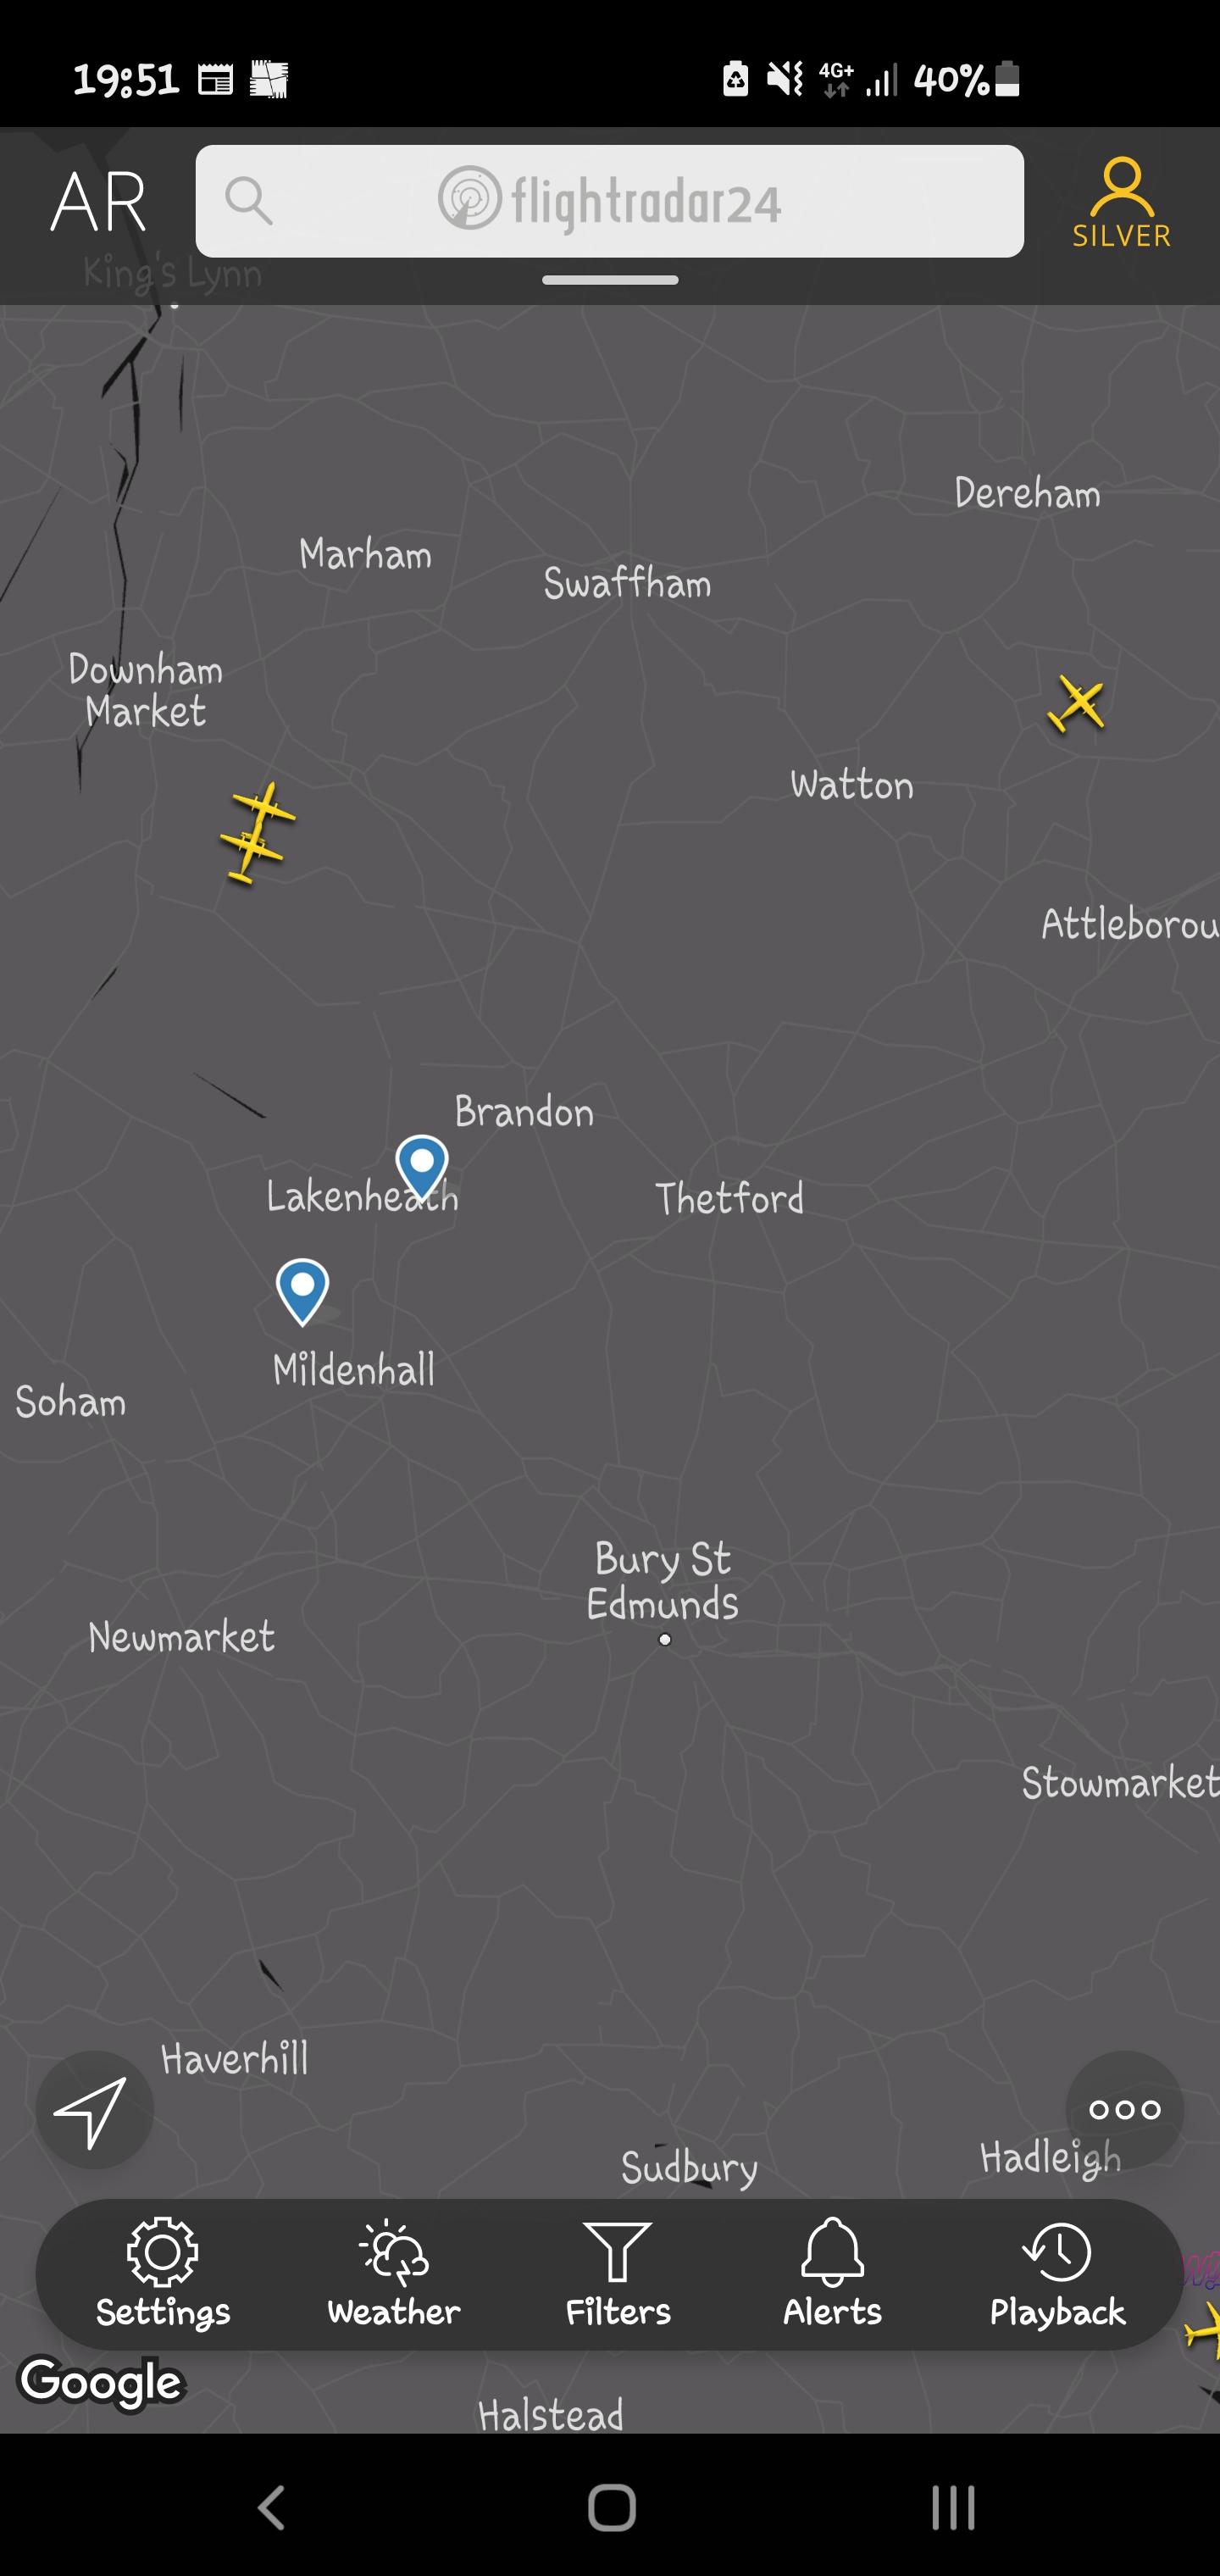 Screenshot_20210329-195117_Flightradar24.jpg